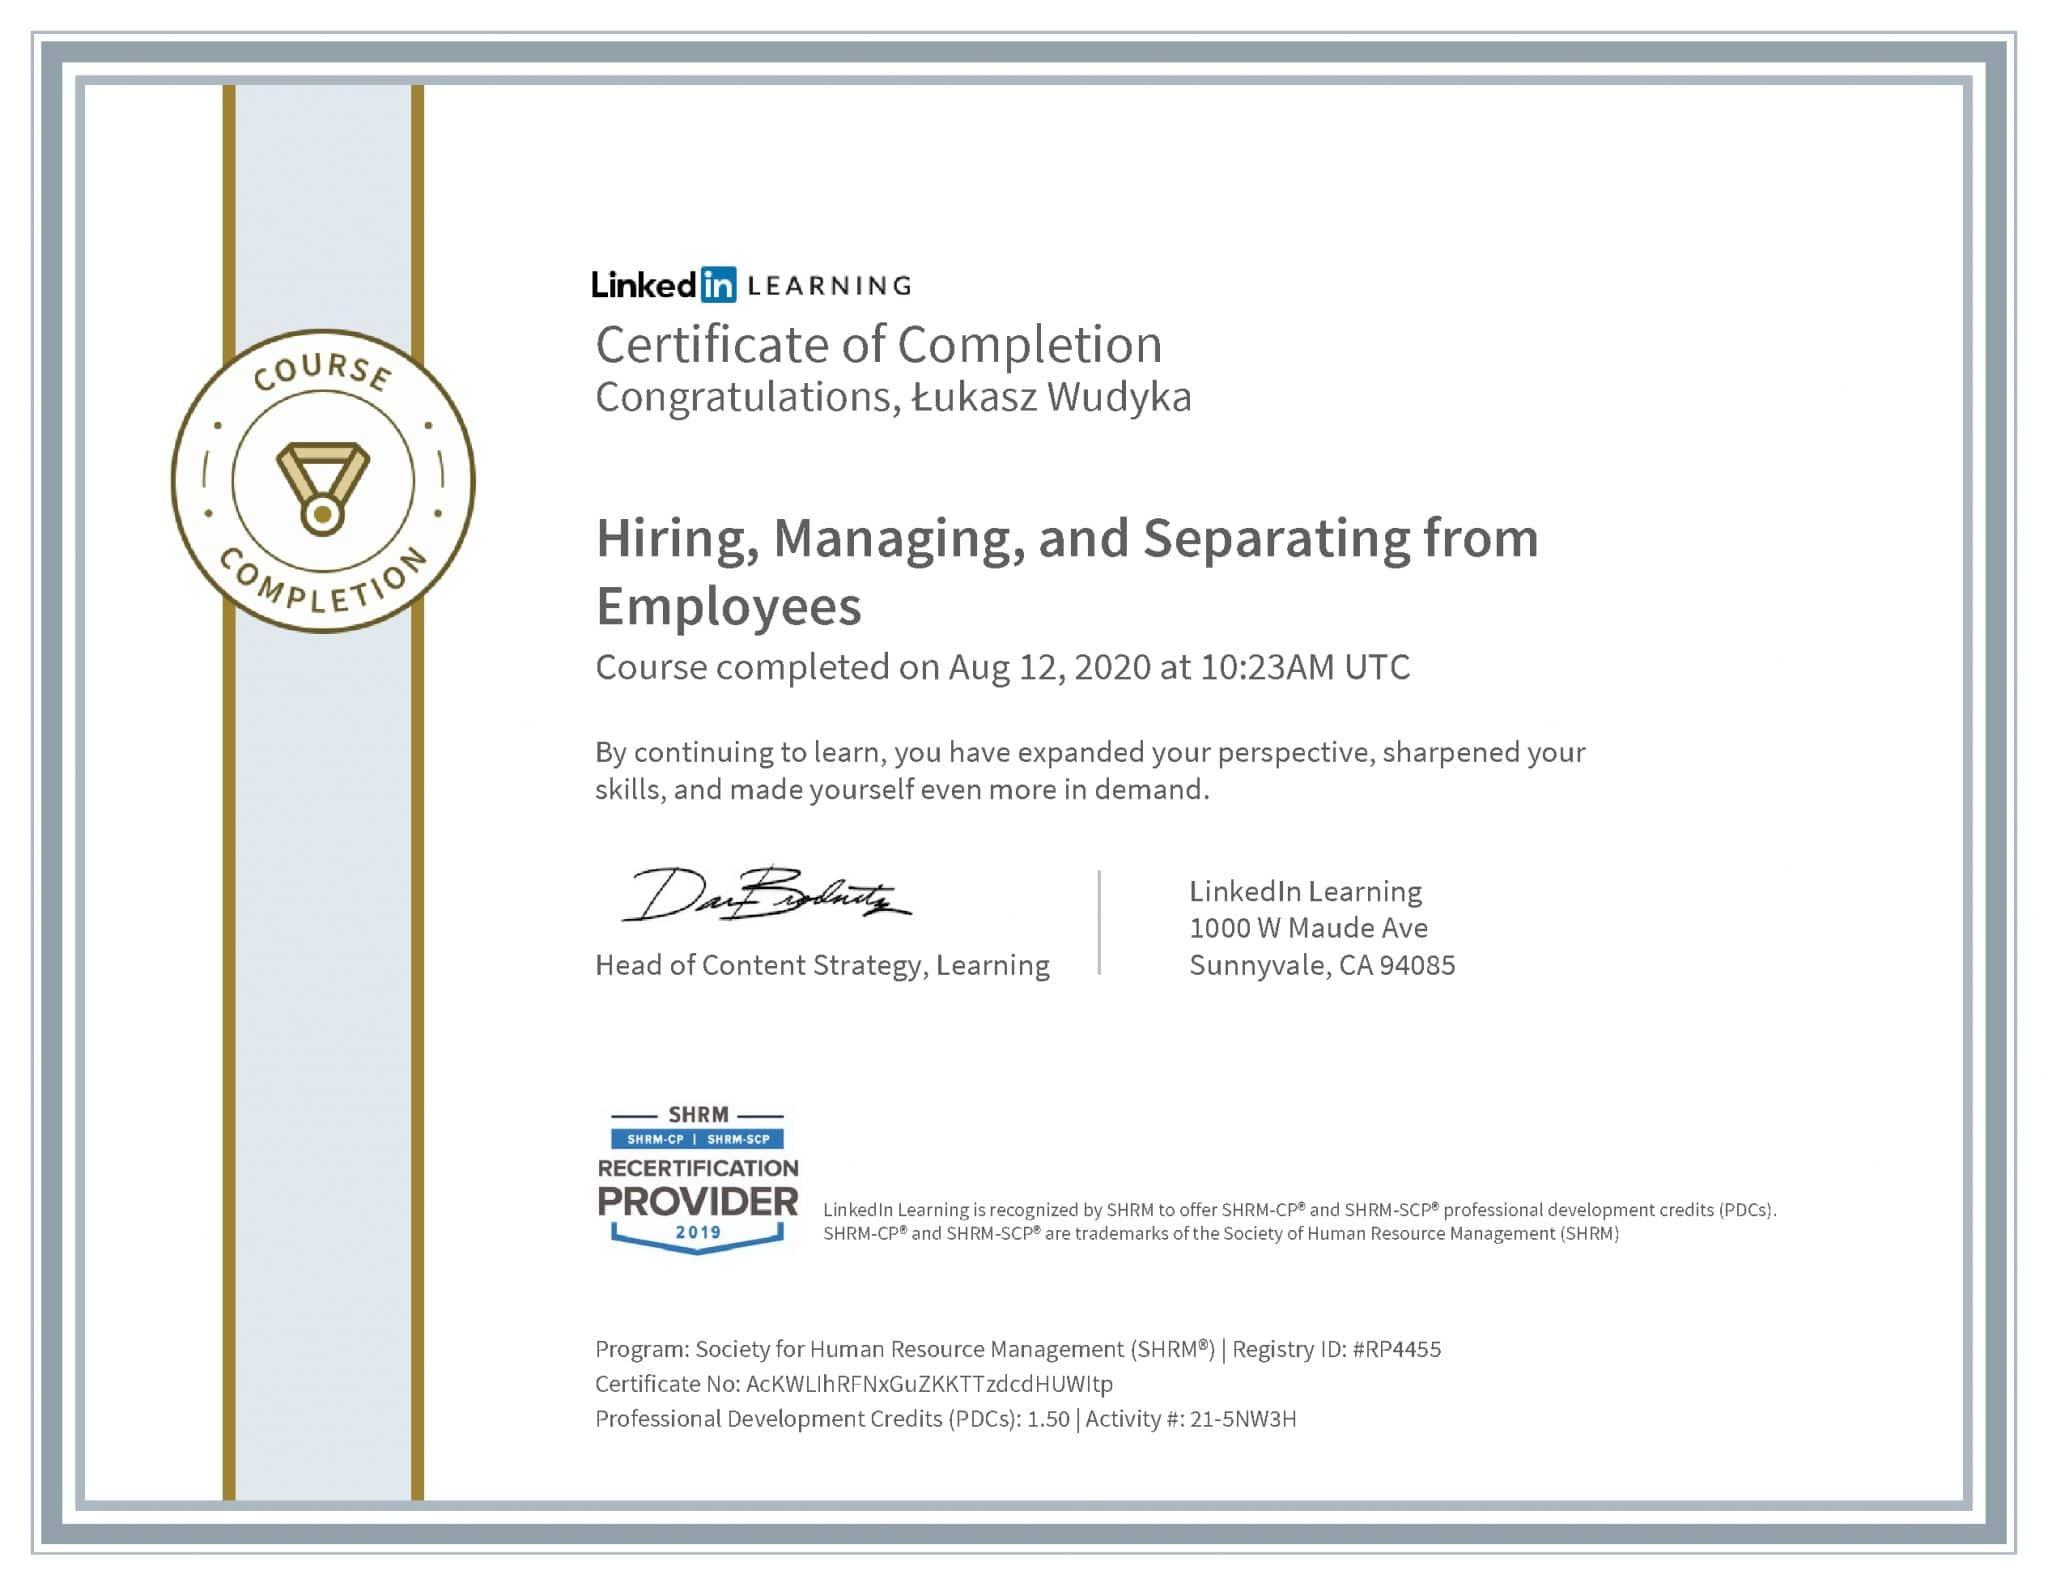 Łukasz Wudyka certyfikat LinkedIn Hiring, Managing, and Separating from Employees SHRM